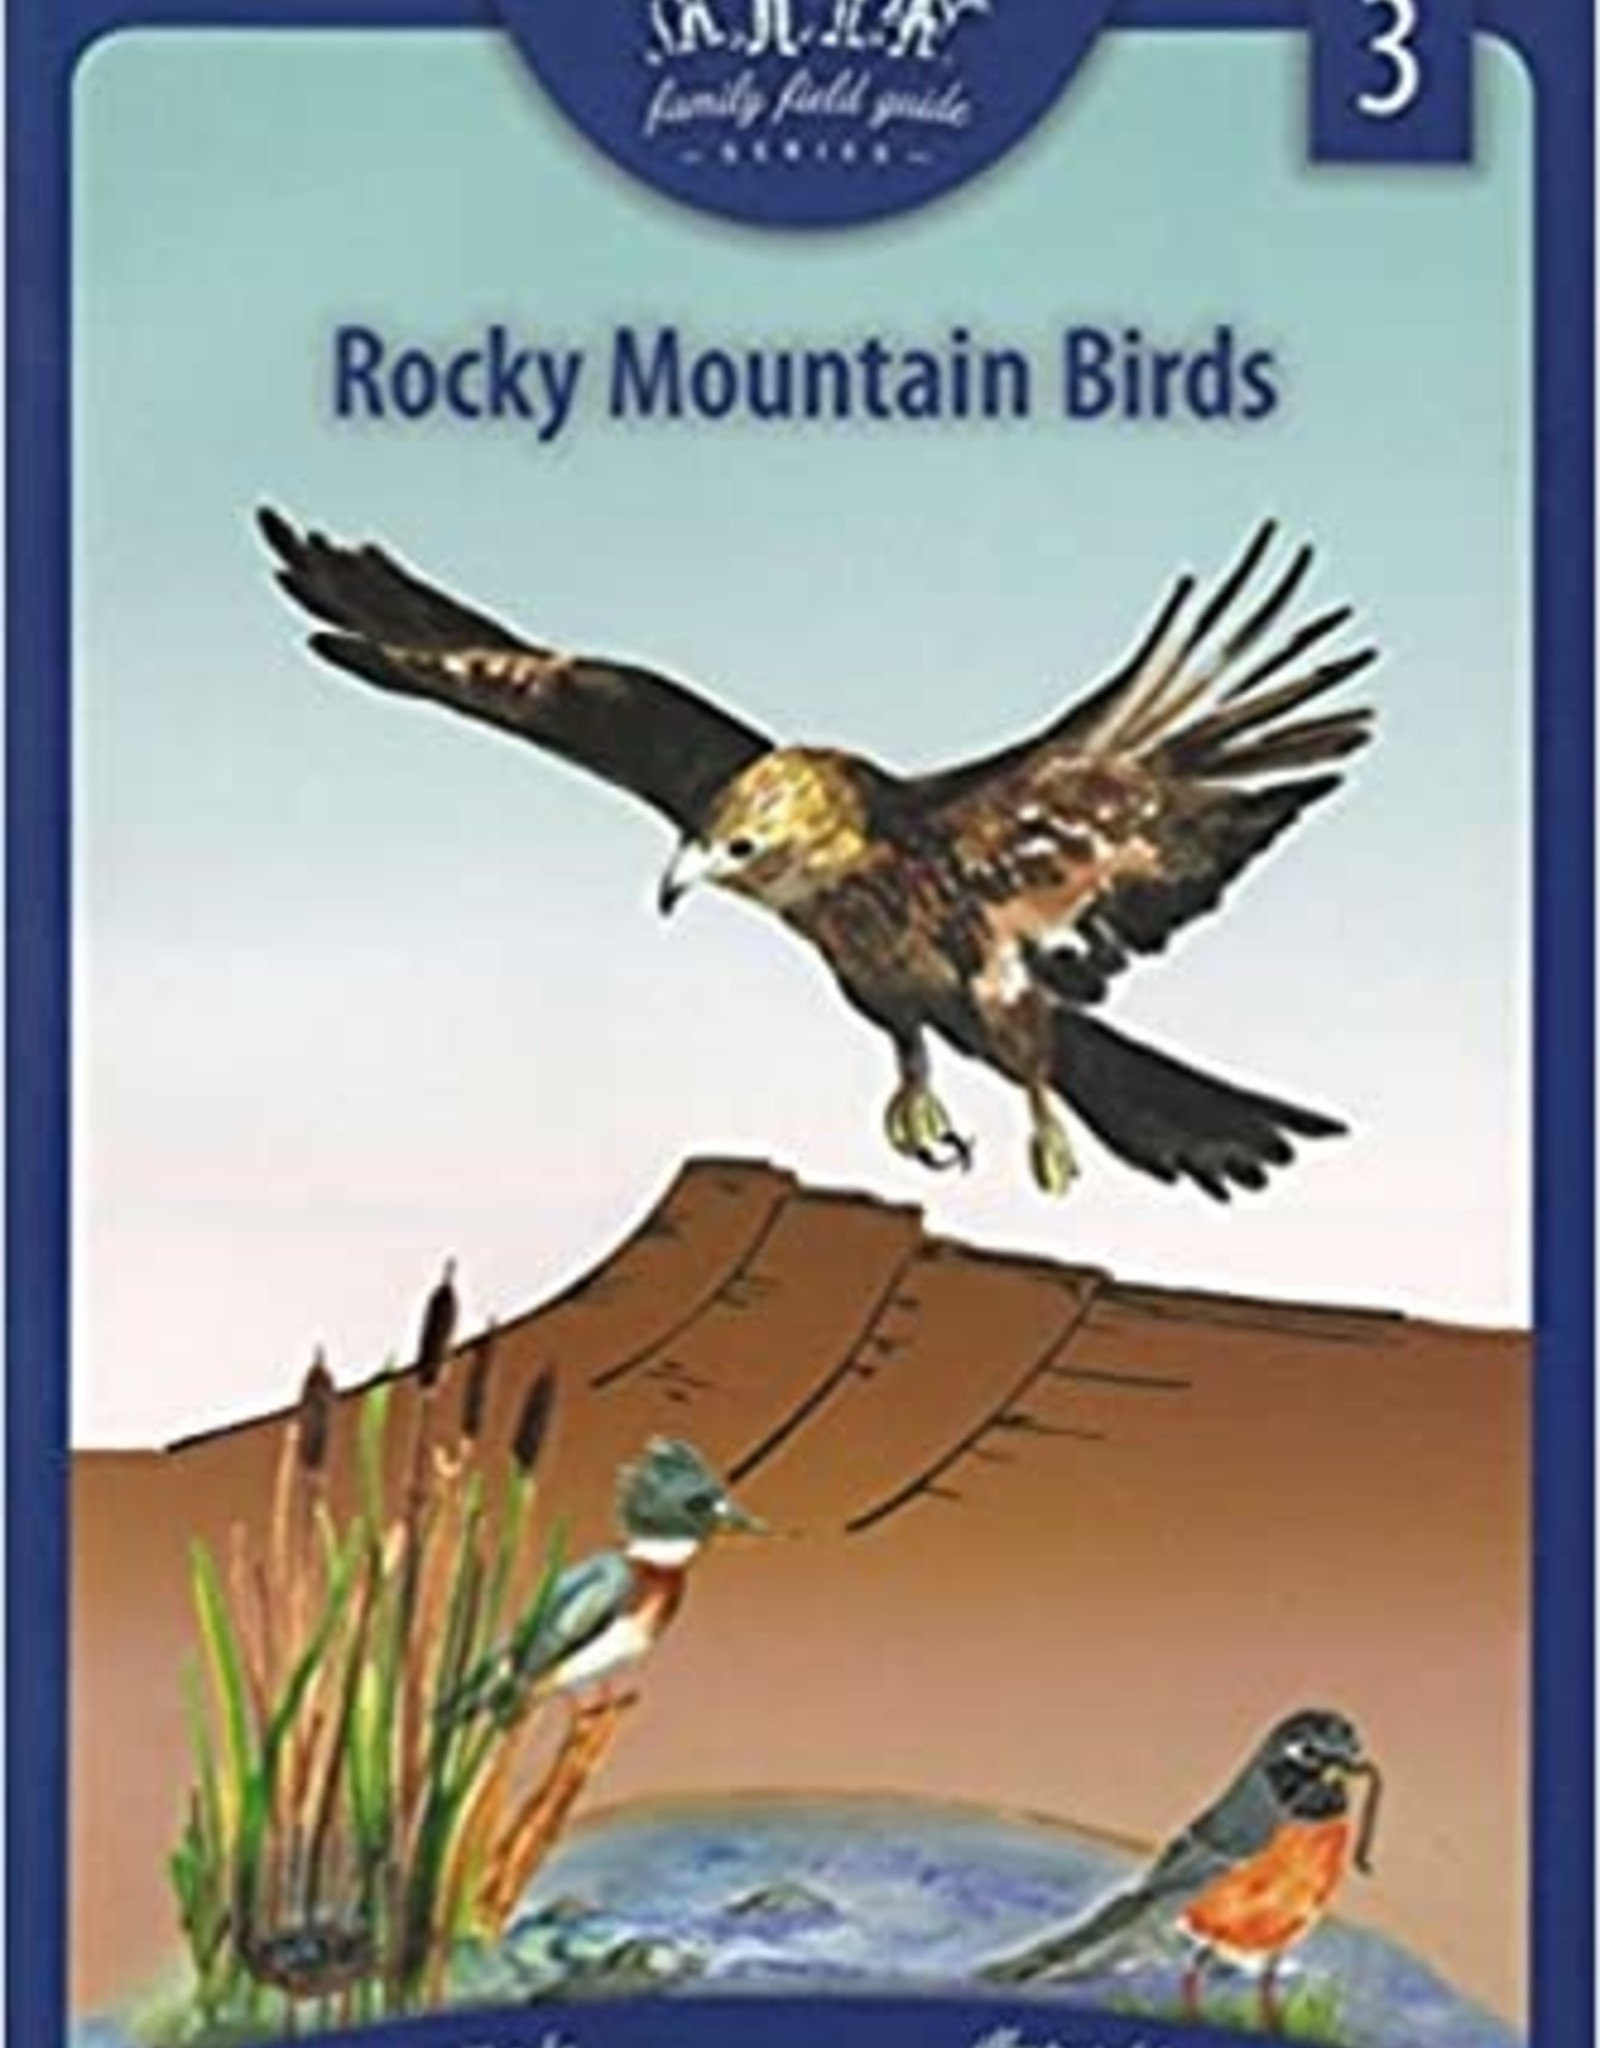 Rocky Mountain Birds: Family Field Guide Series, Volume 3   / Garrick Pfaffman and Hilary Forsyth